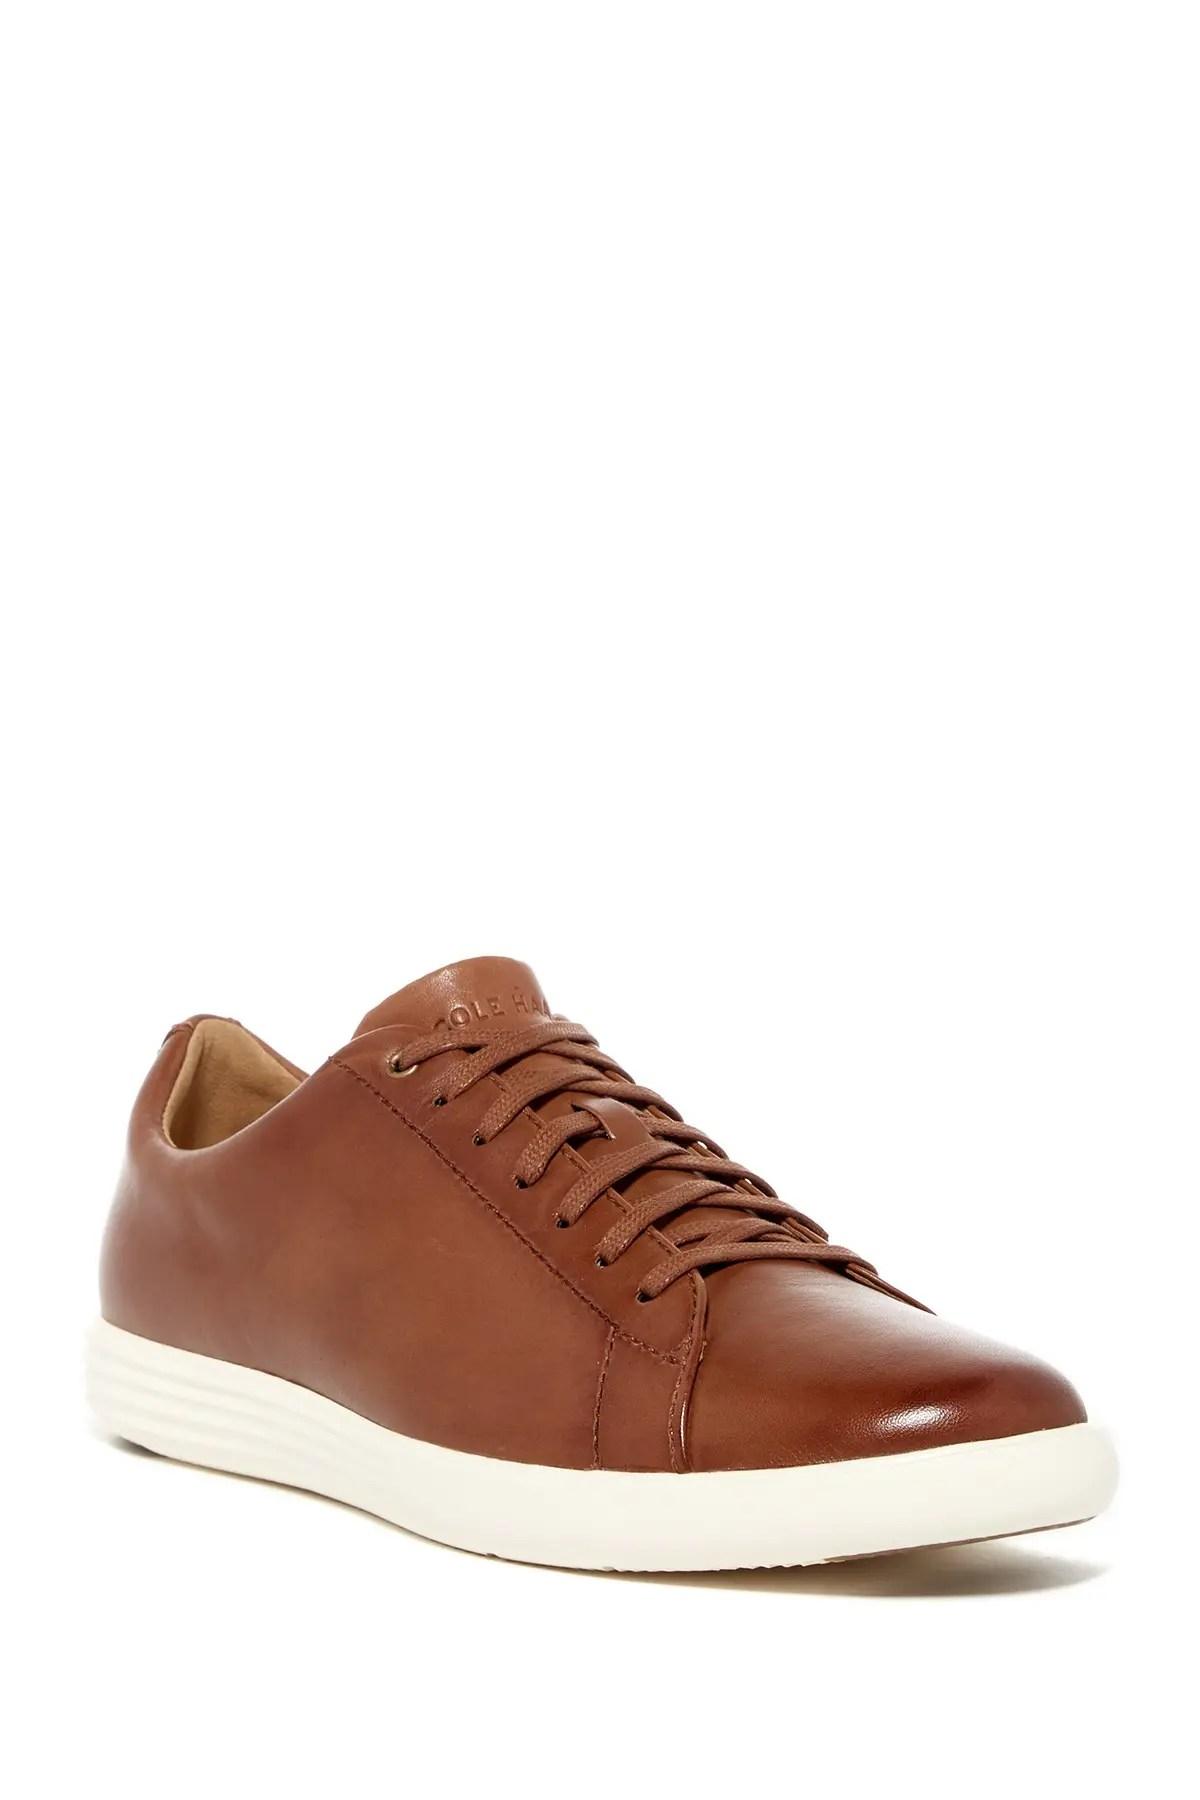 cole haan shoes for men nordstrom rack